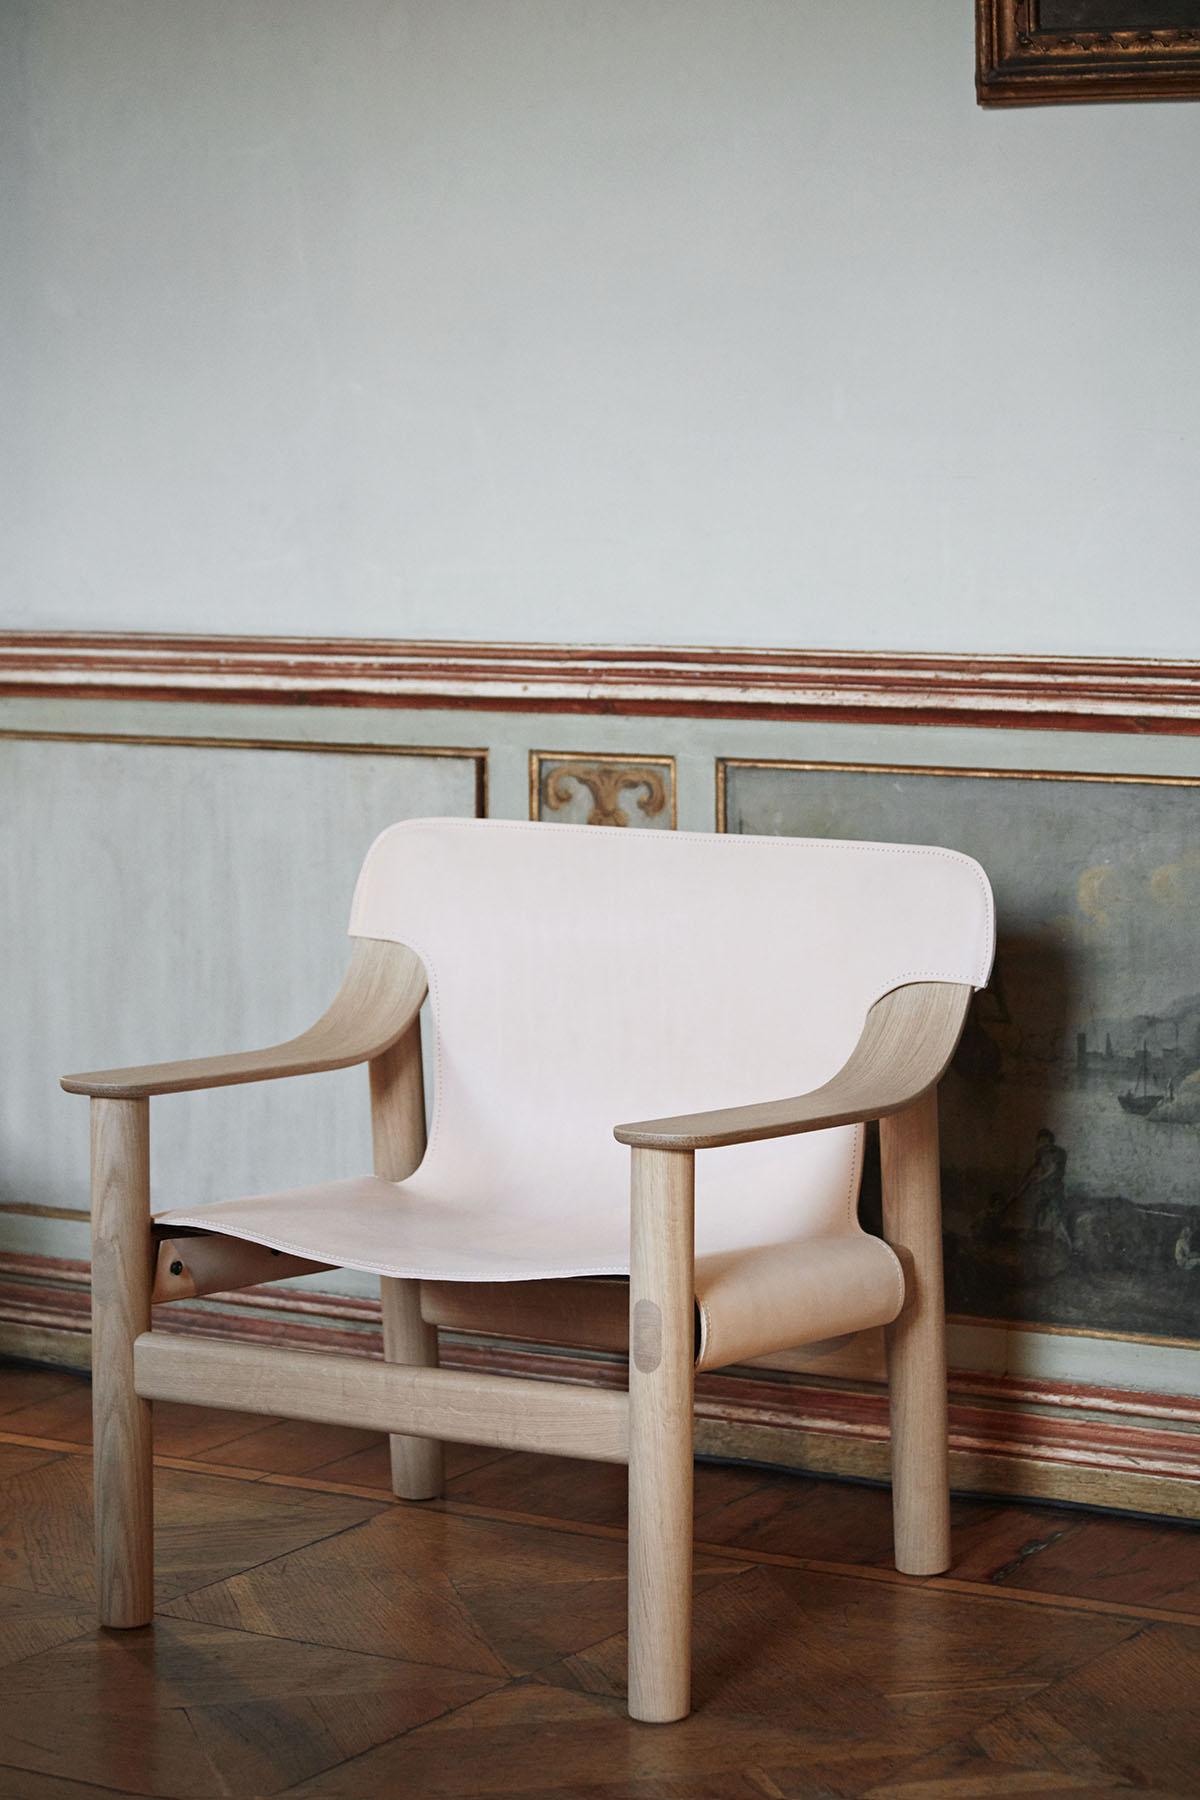 Hay_Shane-SchnecK_Bernard-Chair.jpg